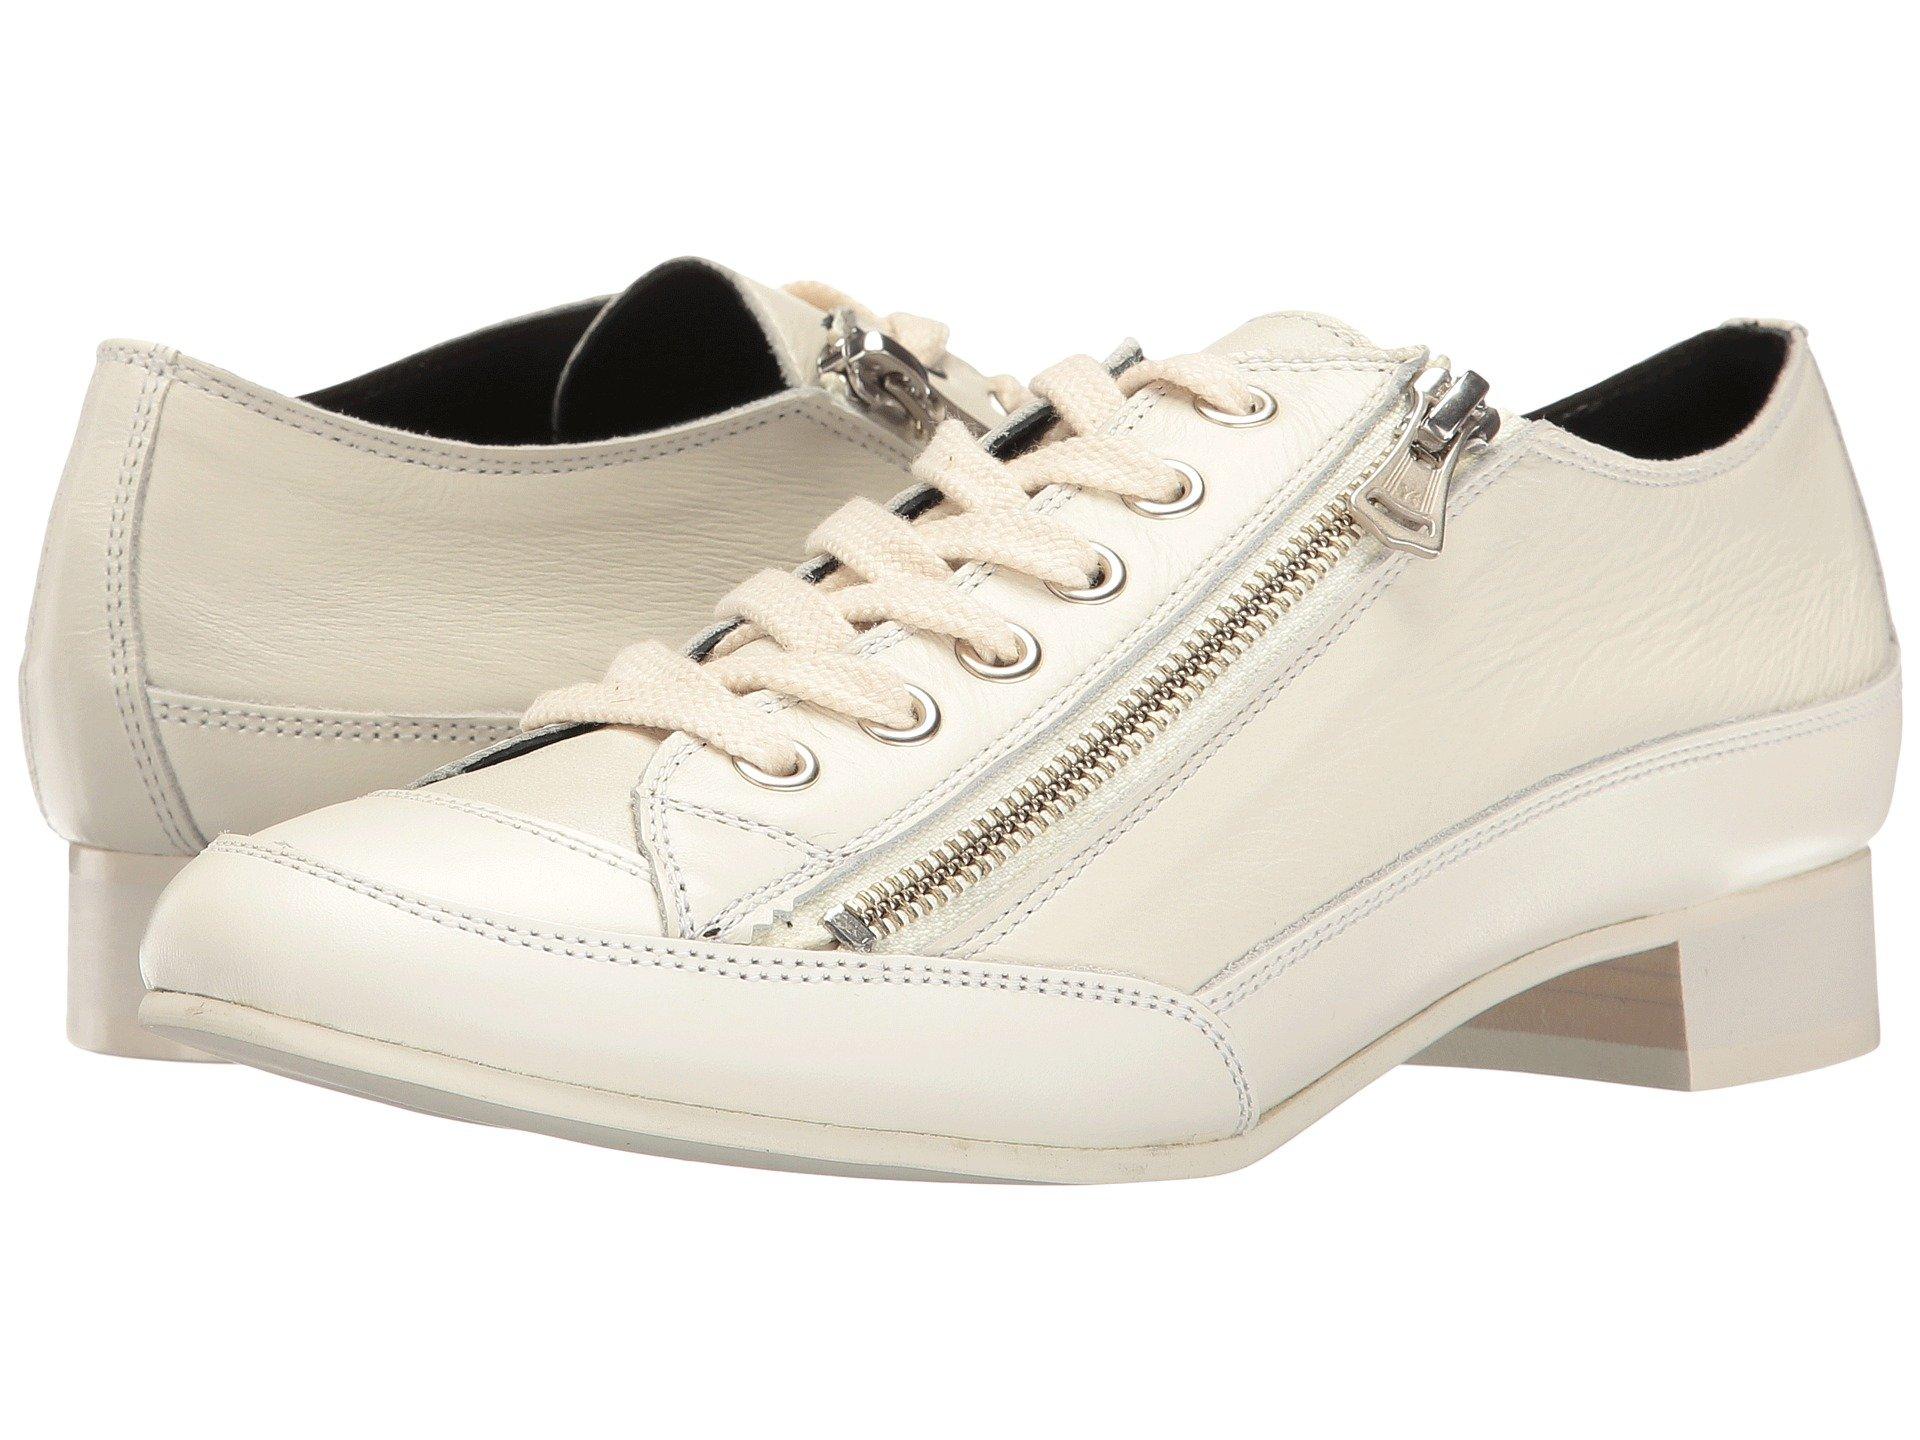 Tenis para Mujer Yand#39;s by Yohji Yamamoto Side Zipper Low Shoes  +